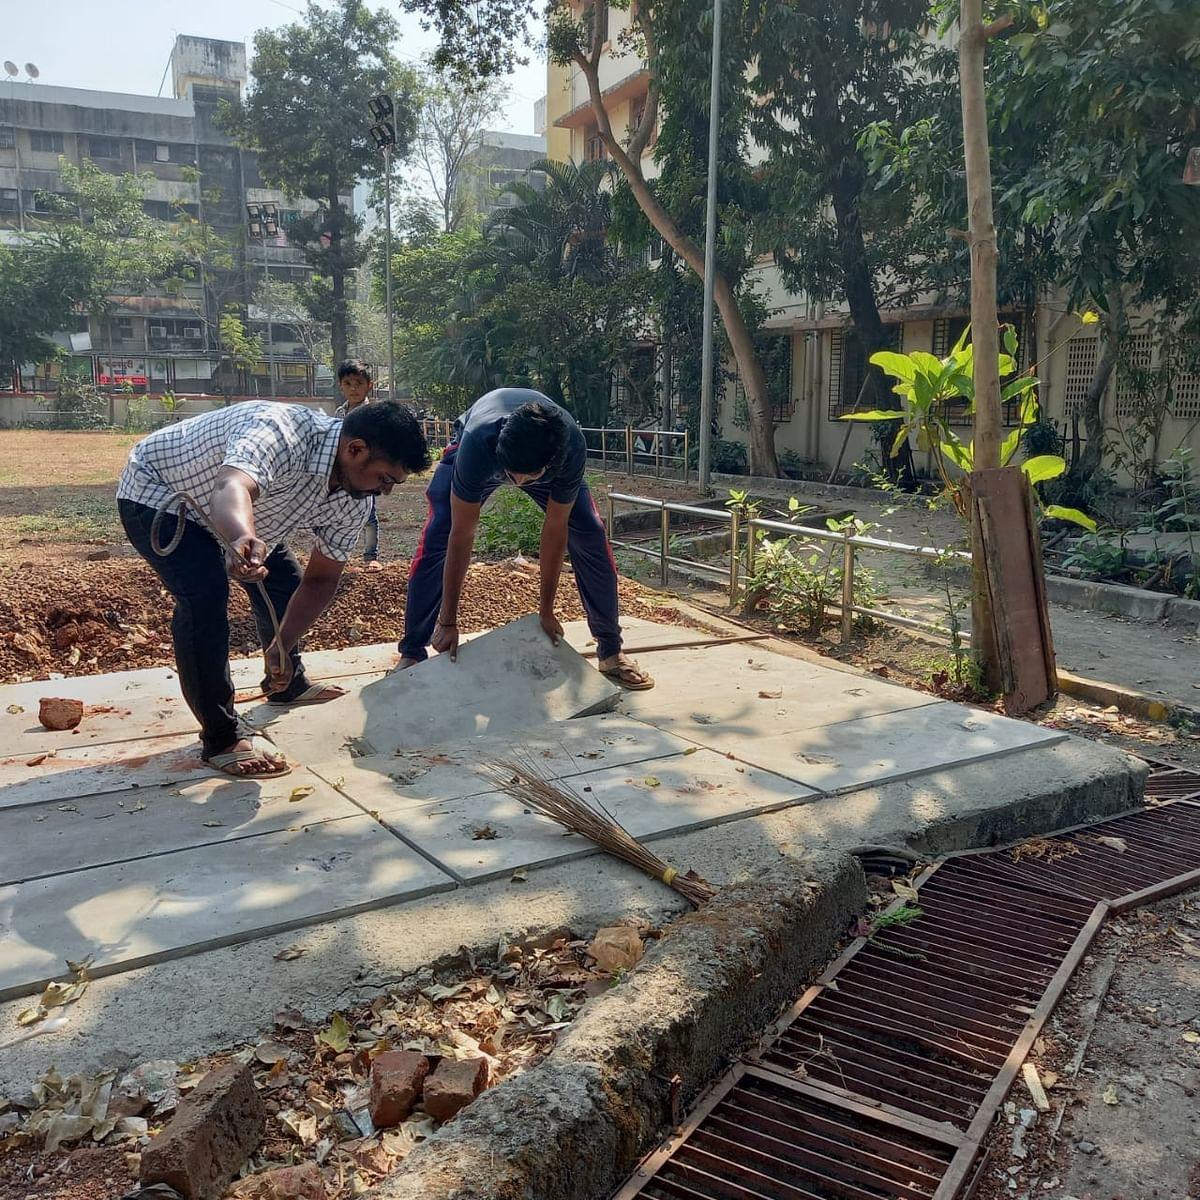 Mumbai: BMC to set up 13 rainwater harvesting pits in K-West ward